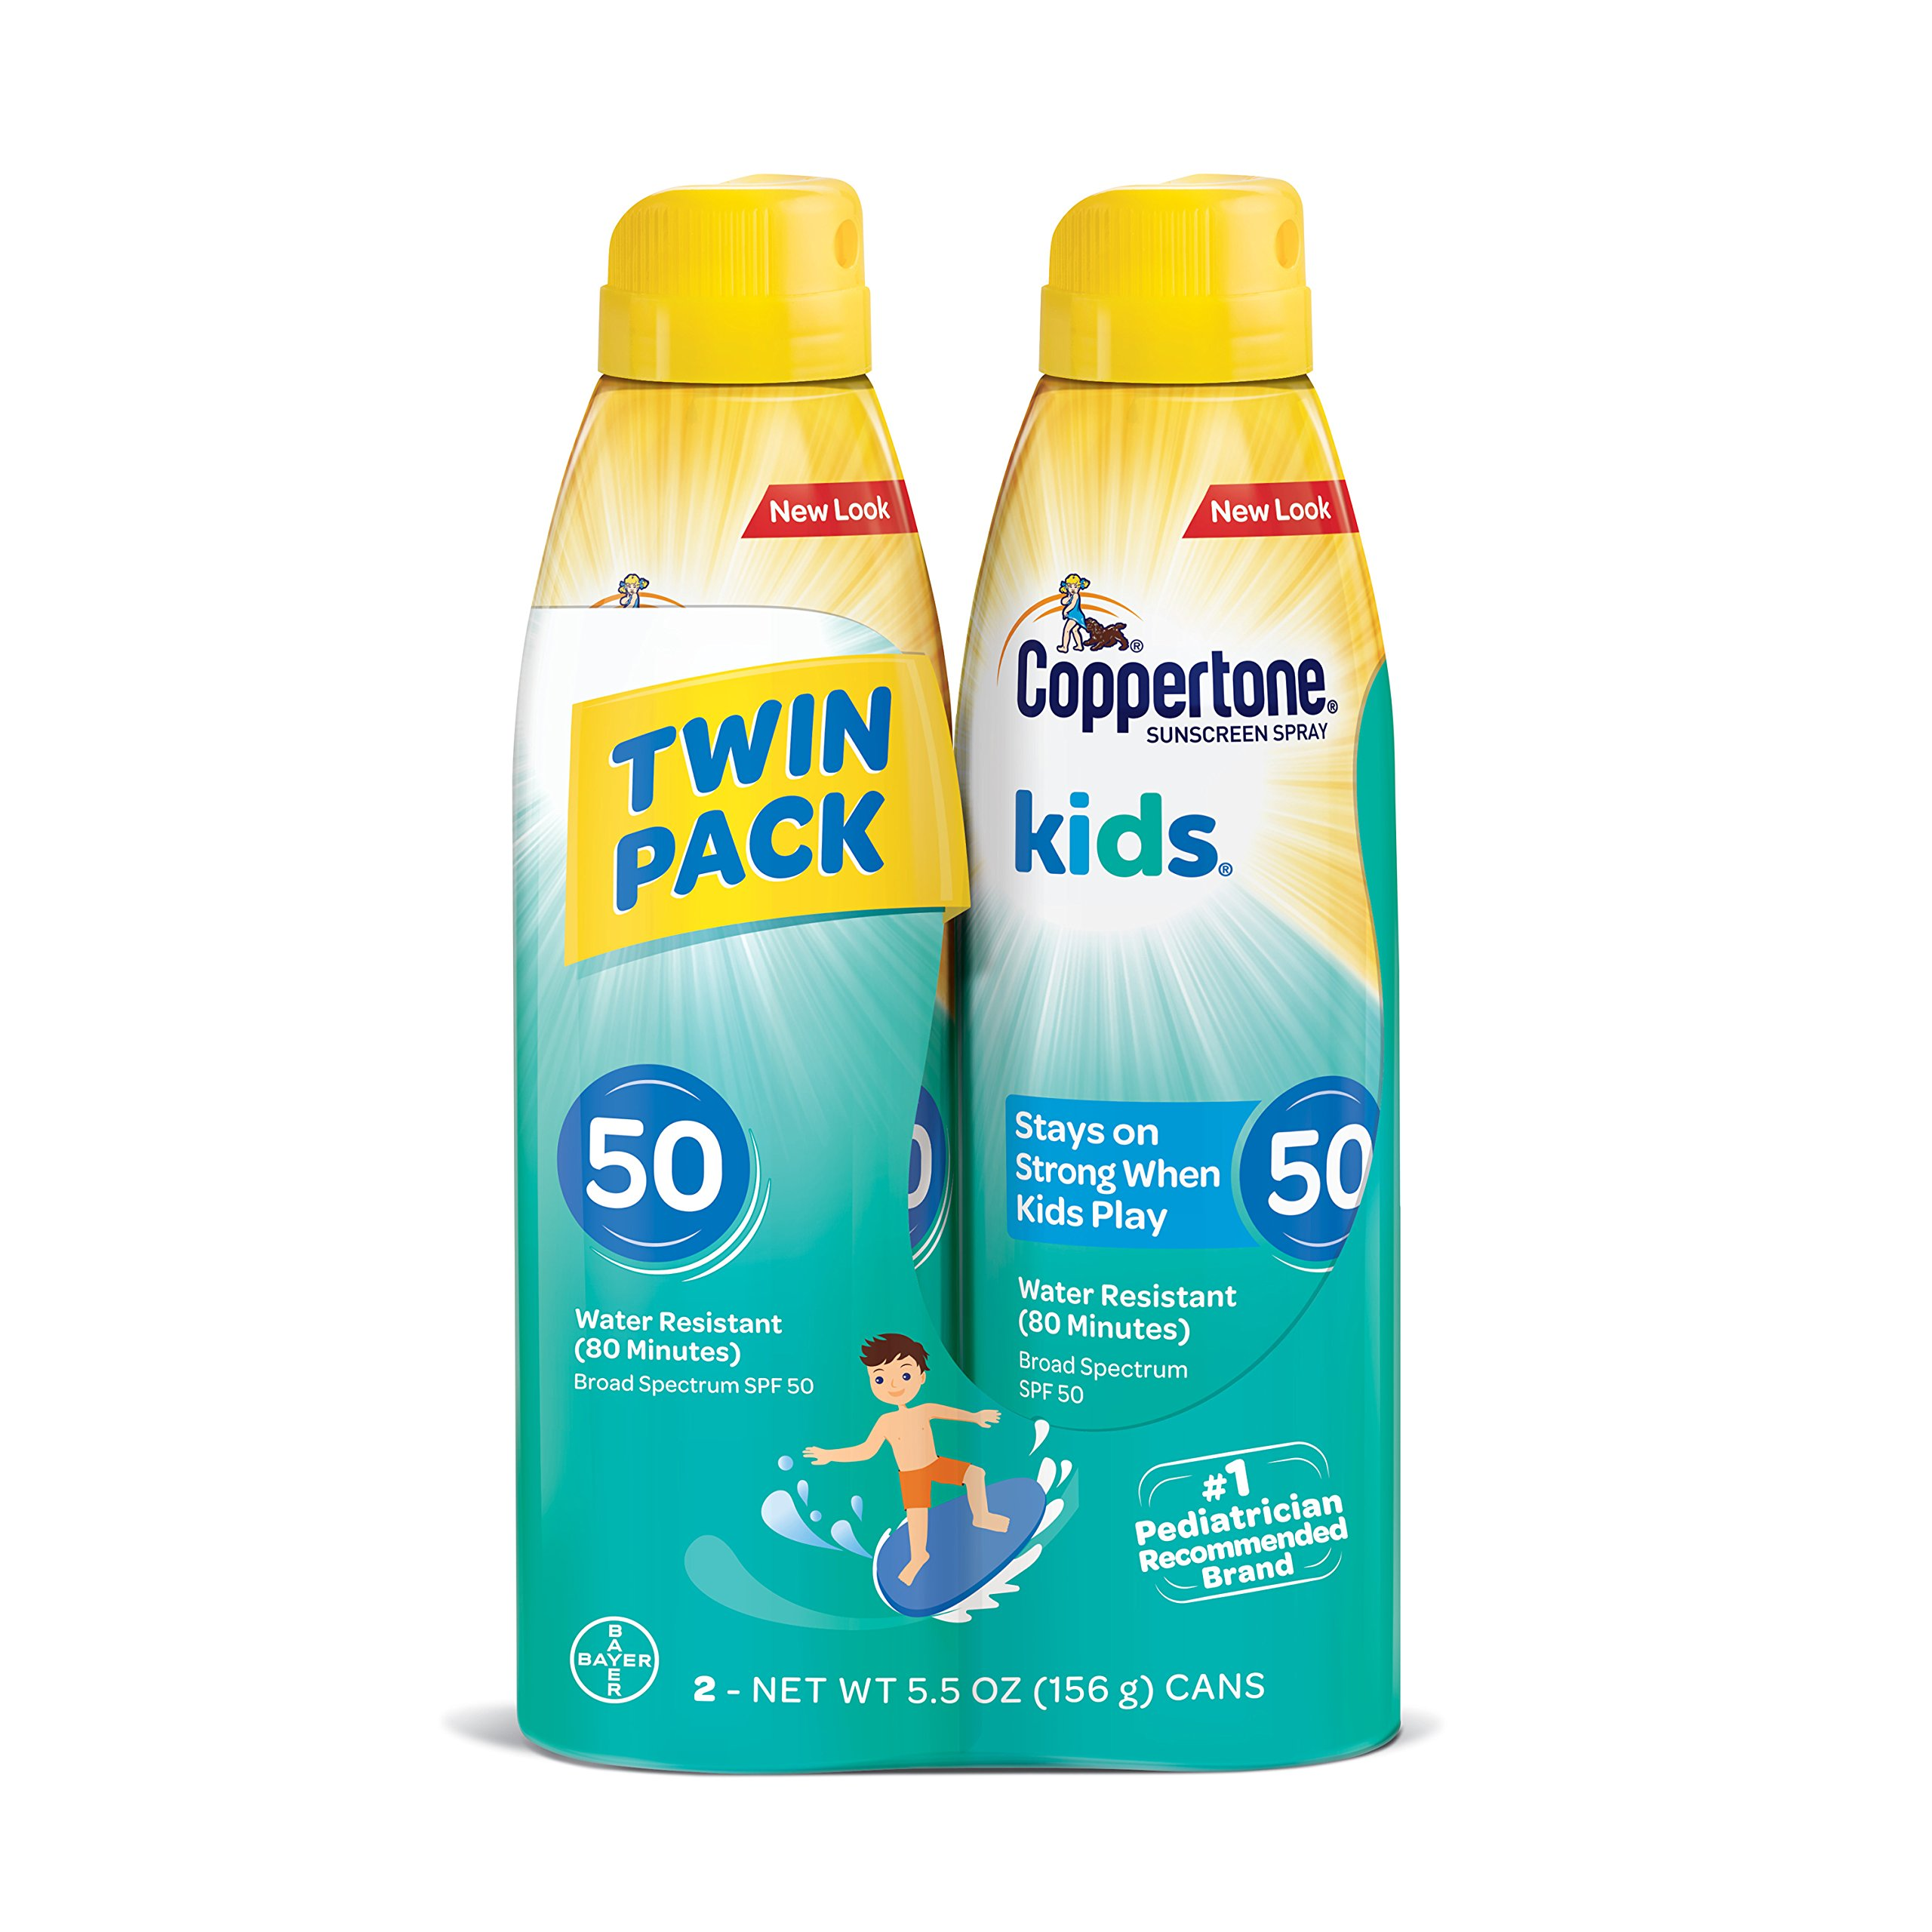 Amazon Coppertone Kids Sunscreen Tear Free Mineral Based Water